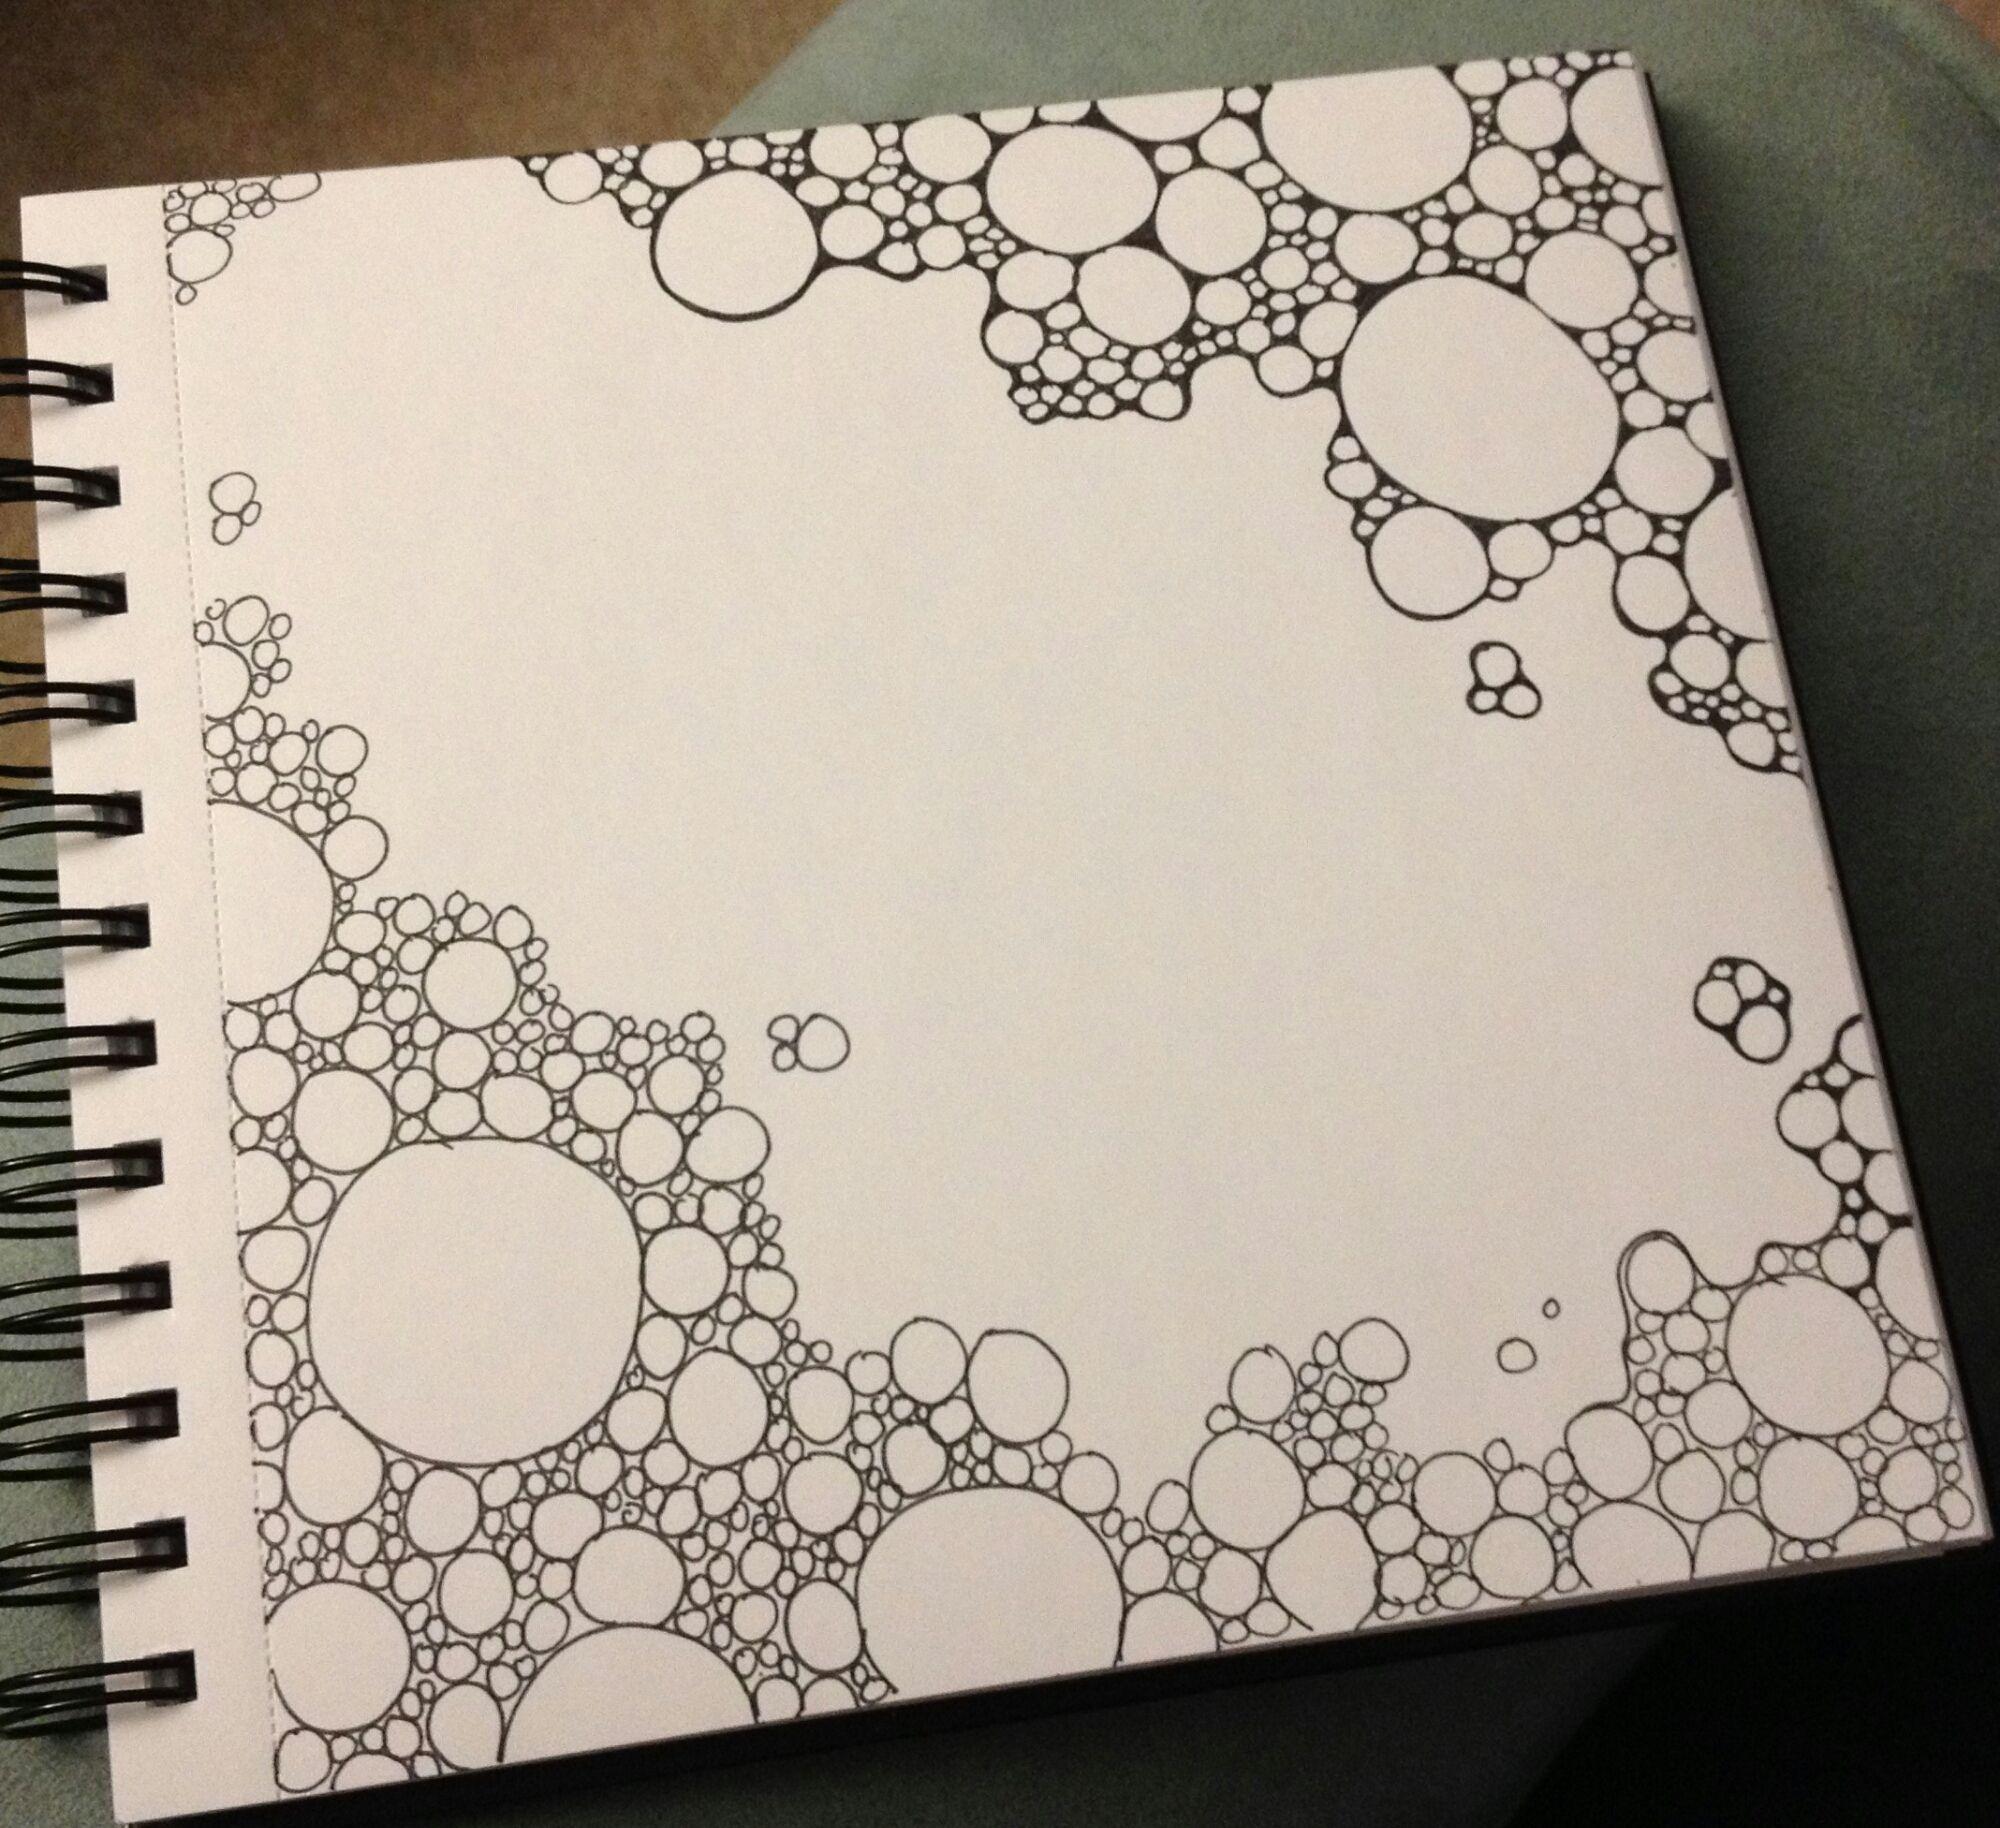 Easy Doodle Art Designs : Progress shots of a gravel doodle sharpie drawings